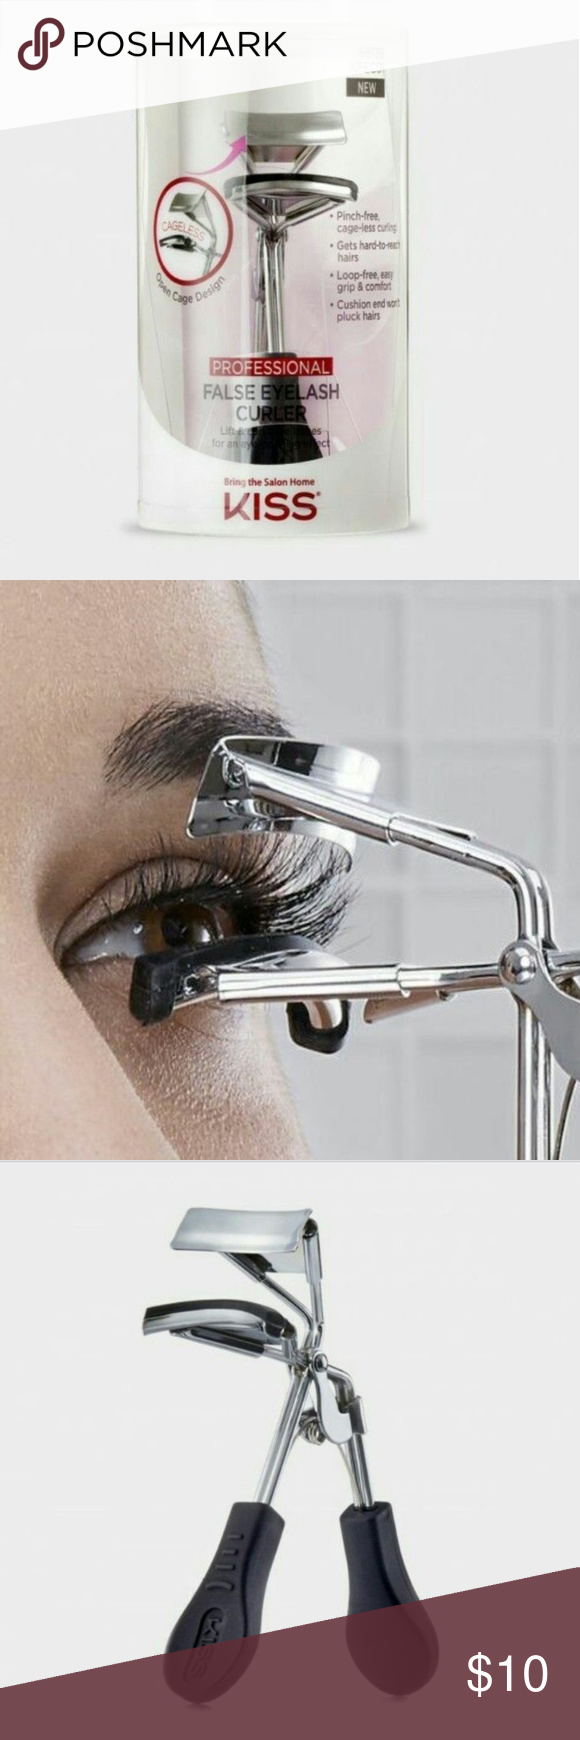 44341e776f9 False Eyelash Curler by Kiss New! Professional false eyelash curler by kiss!  Kiss Makeup